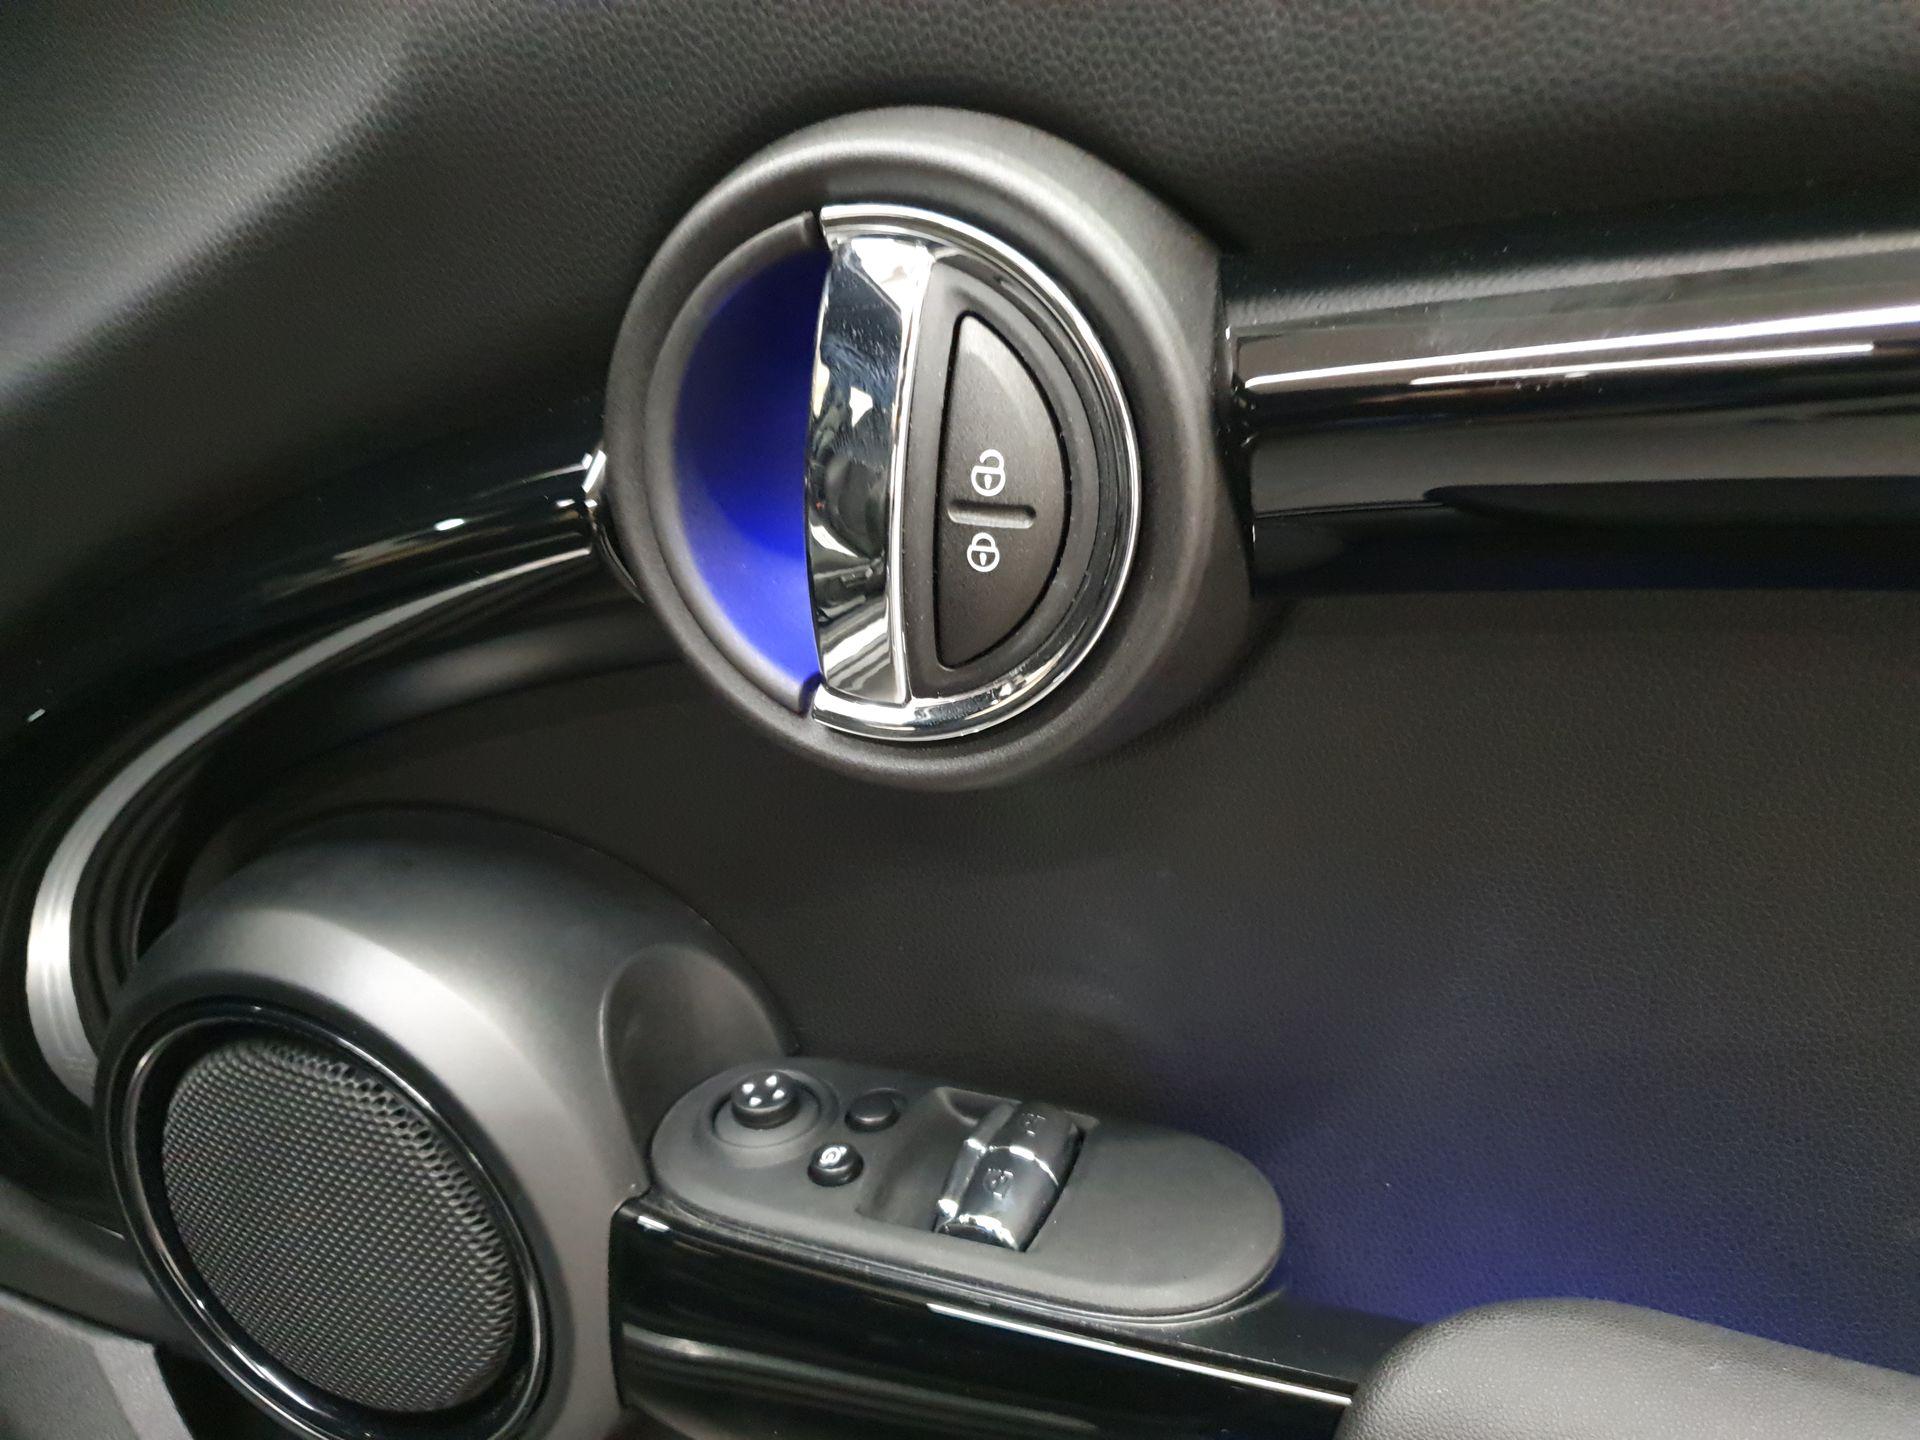 2019 MINI Cooper S 3Dr